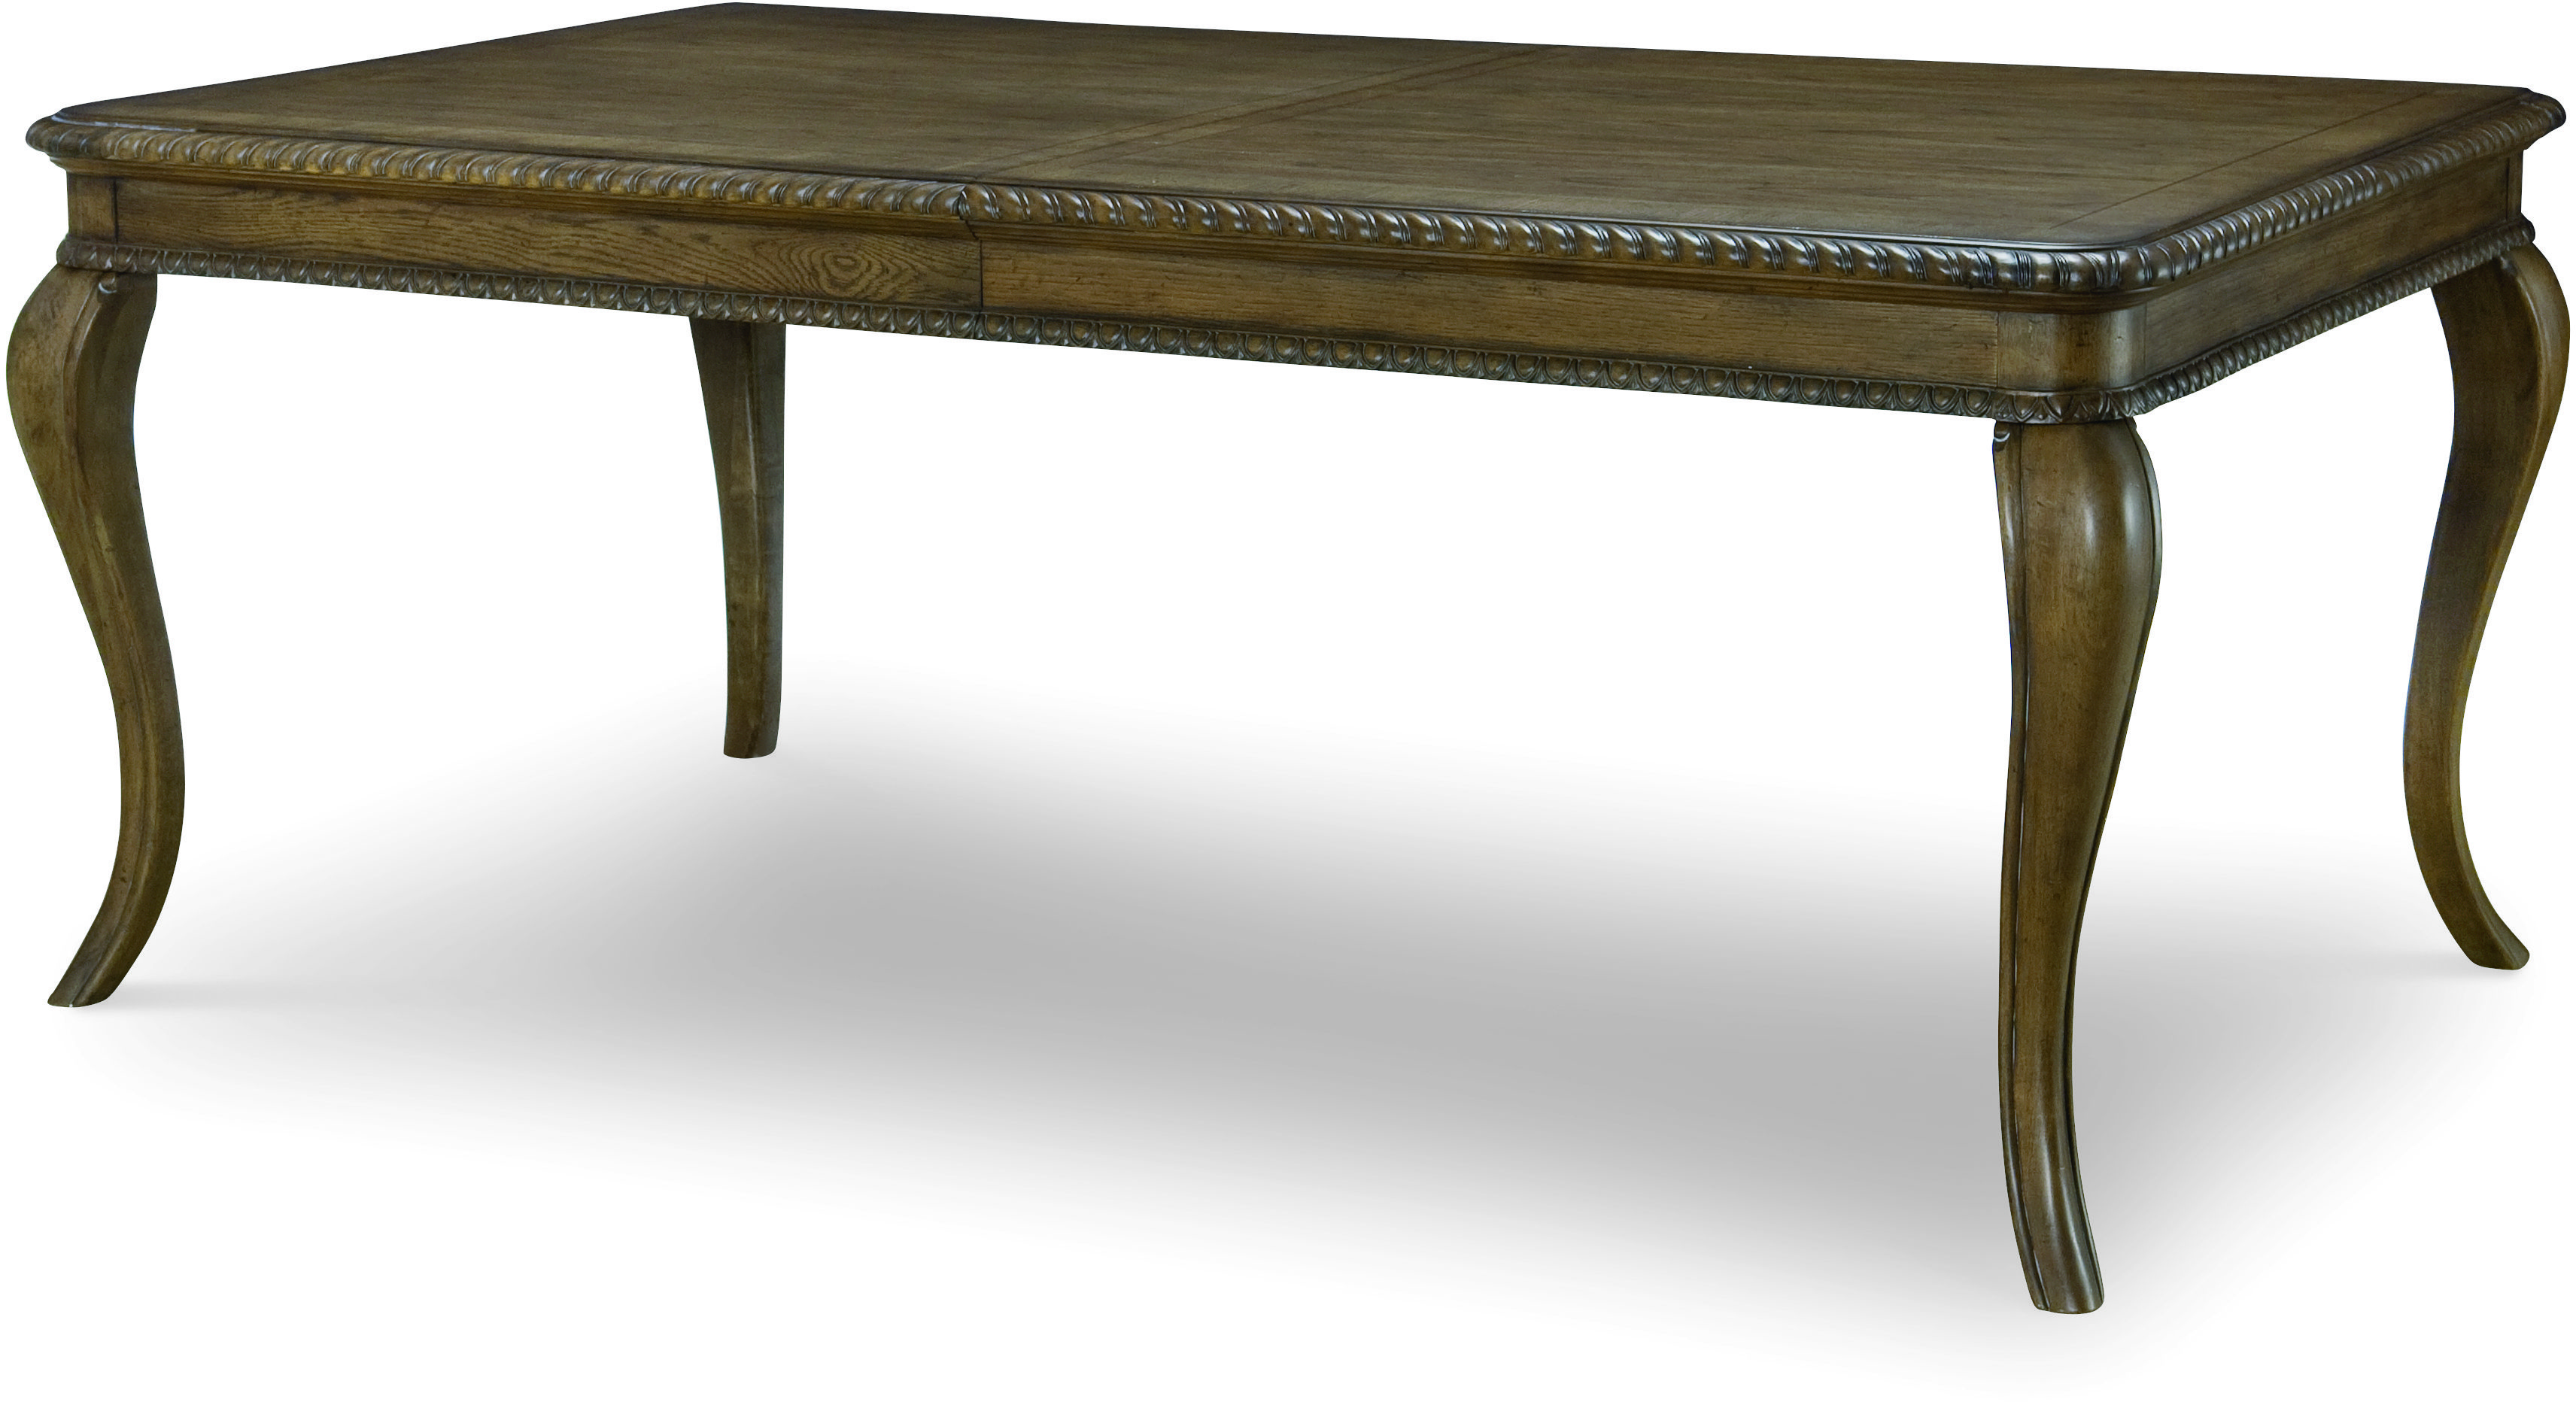 Legacy Classic Renaissance Leg Table  - Item Number: 5500-221